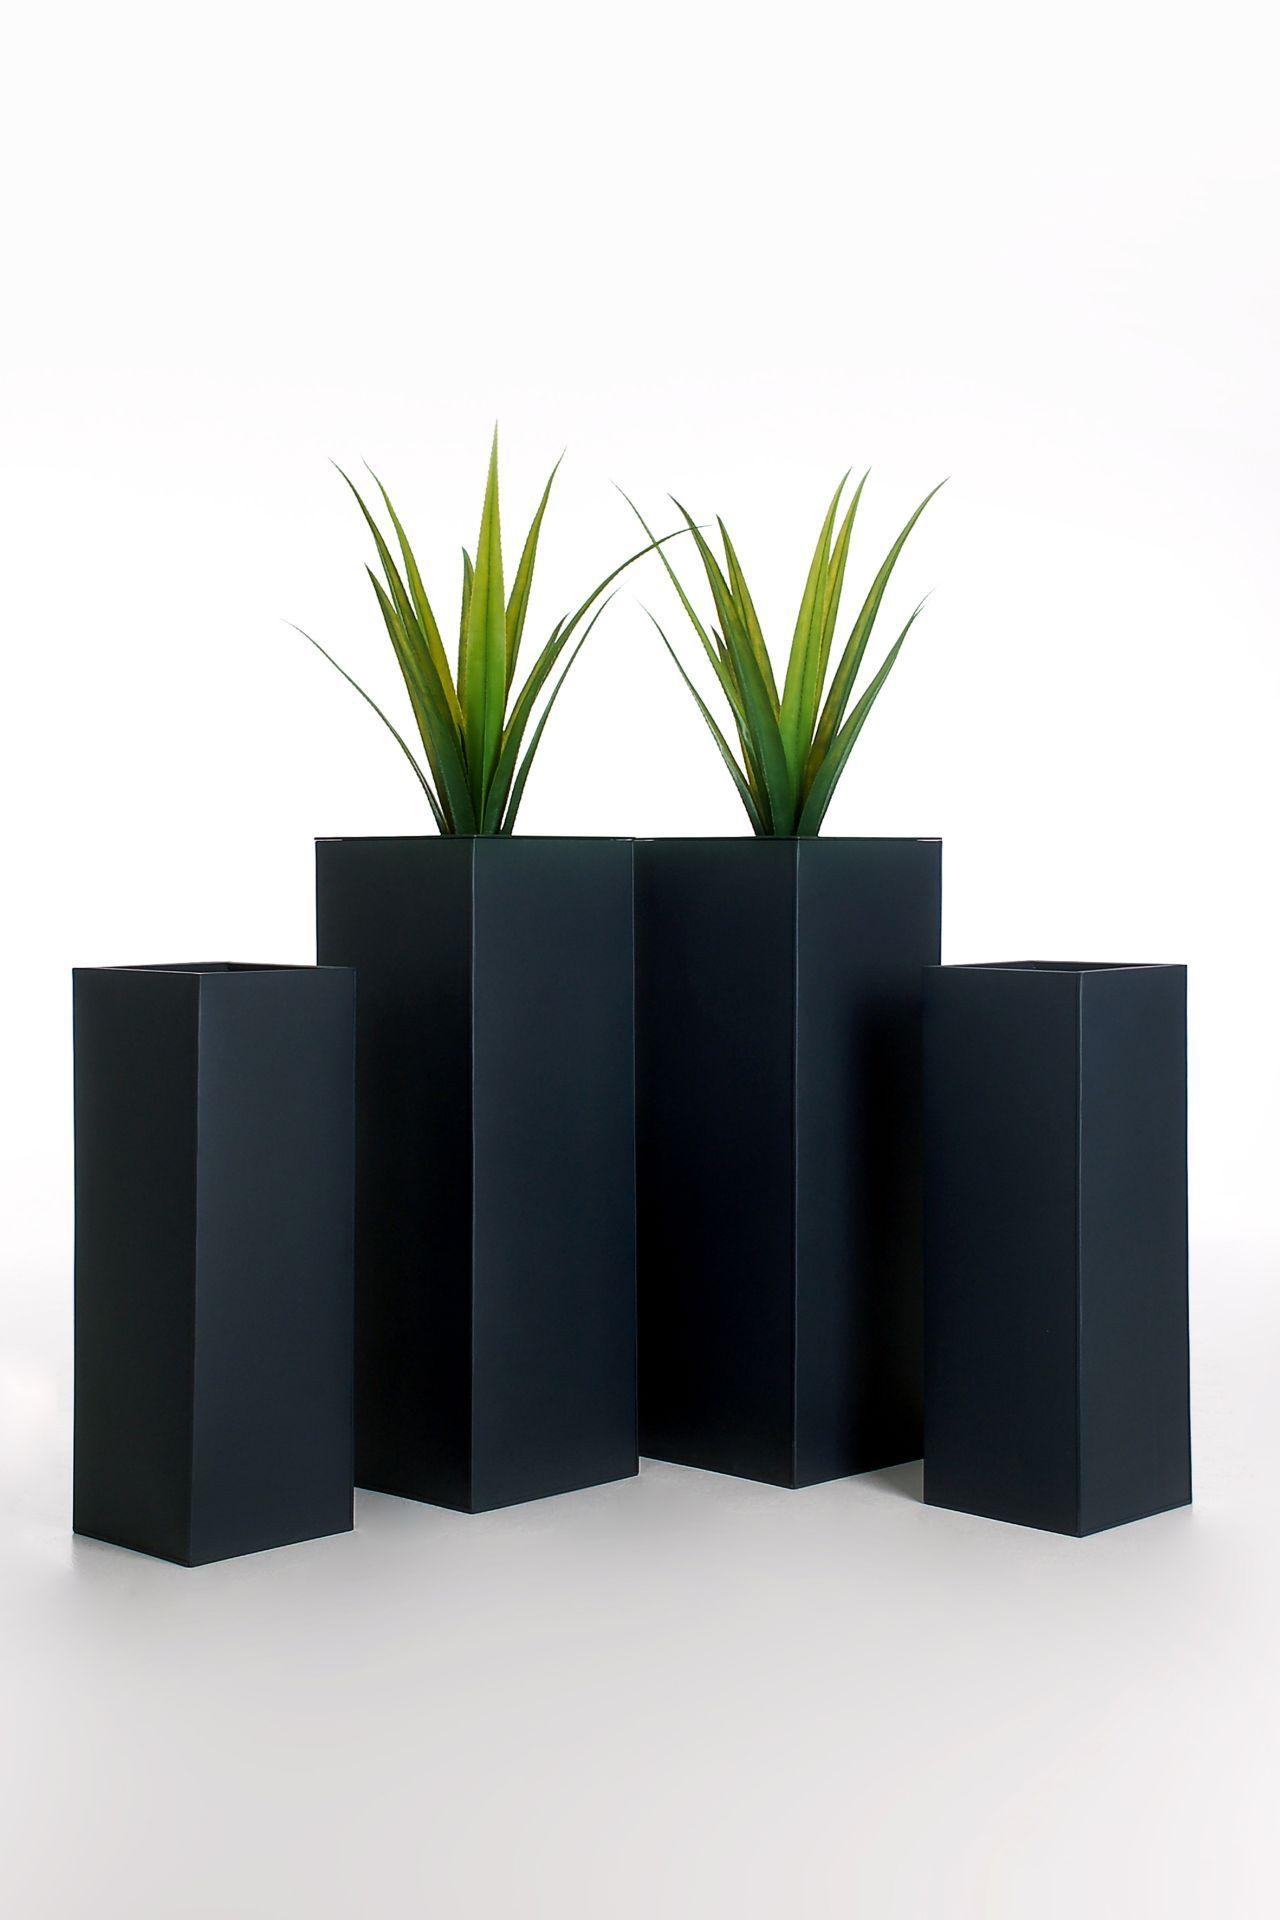 blumenk bel pflanzk bel pflanzgef e aus fiberglas block weiss 50x50x50cm schortens. Black Bedroom Furniture Sets. Home Design Ideas